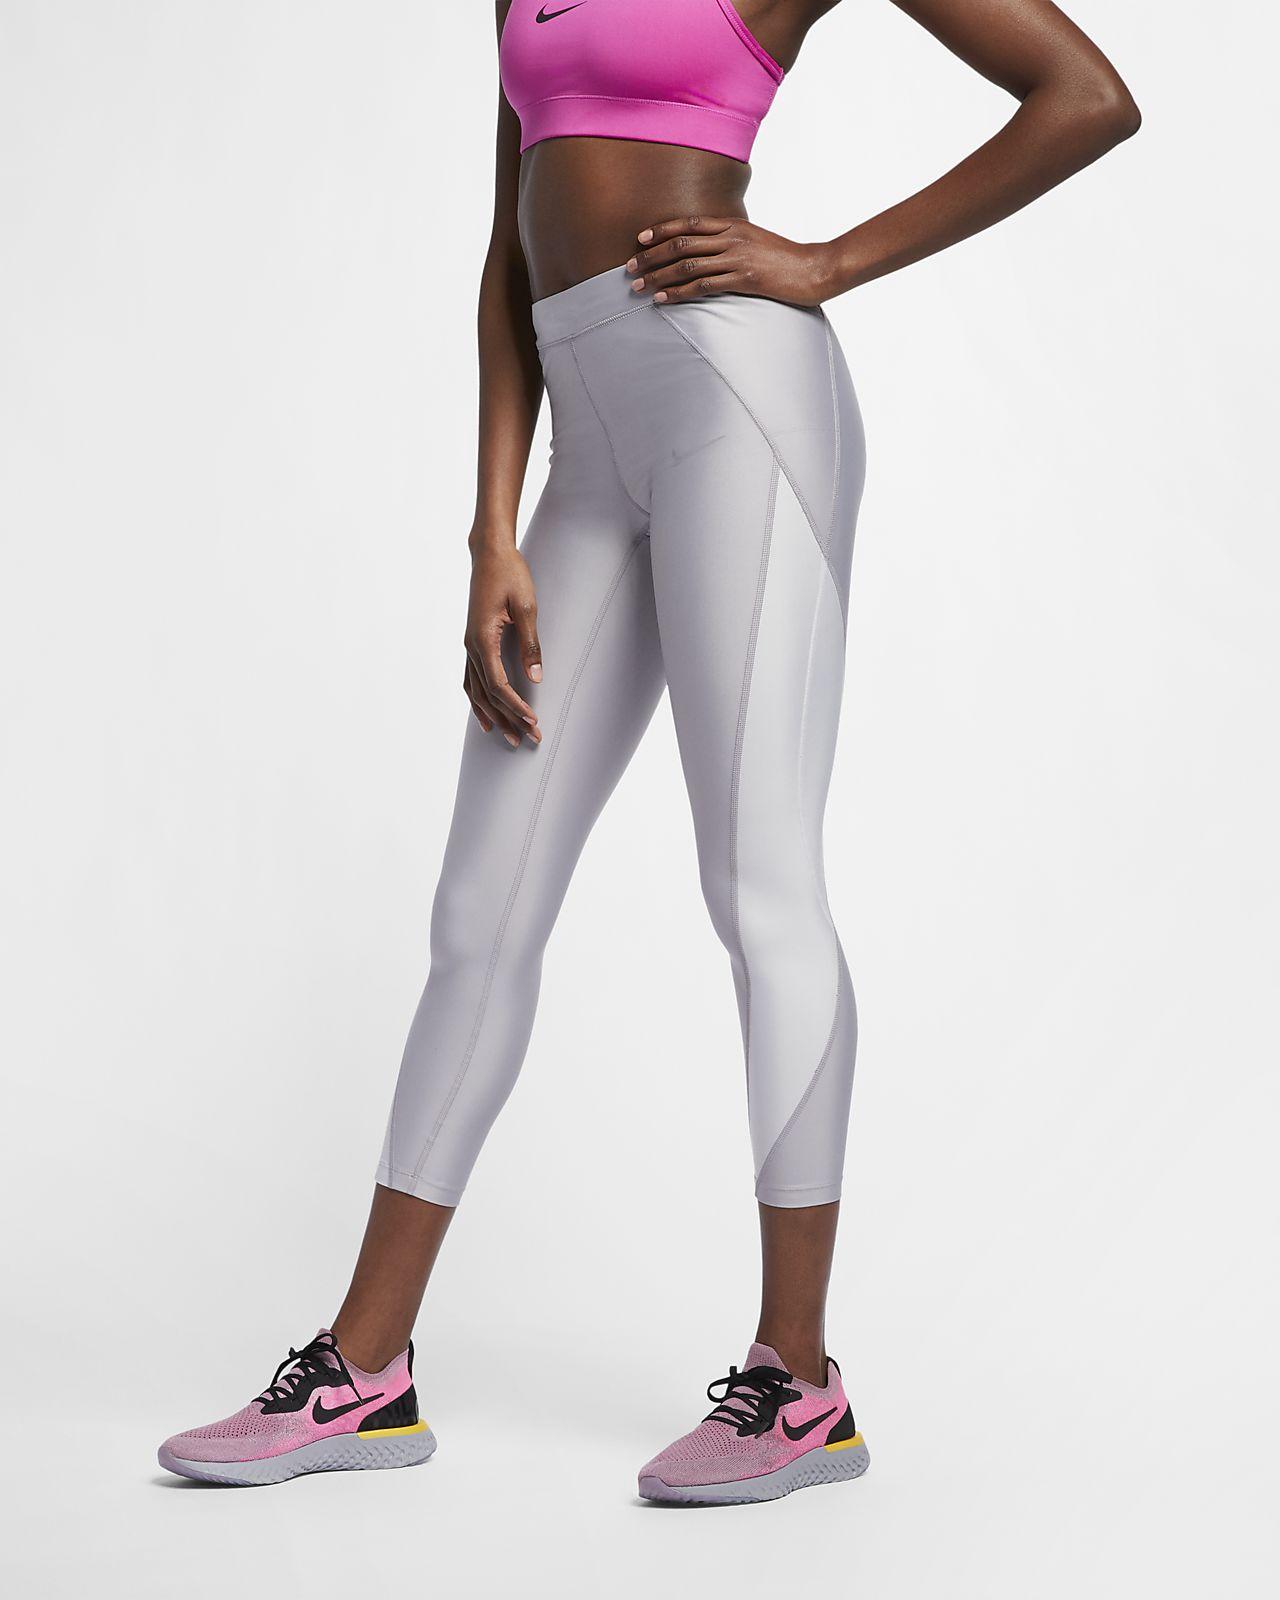 e1350292bc40 ... Γυναικείο μεσοκάβαλο κολάν 7 8 για τρέξιμο με μεταλλιζέ σχέδια Nike  Speed